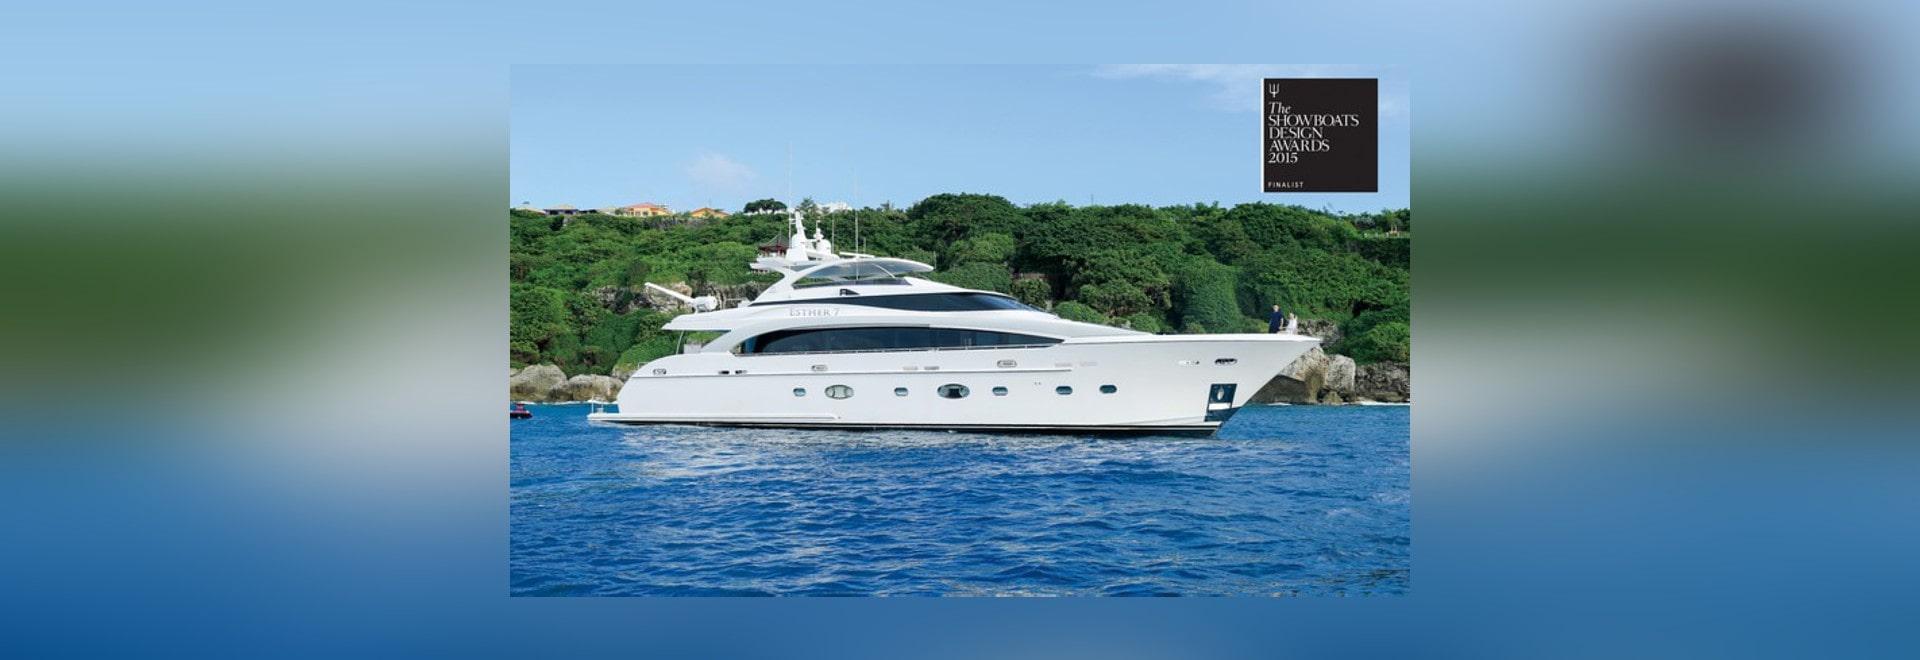 Horizon RP110 Yacht ESTHER 7 among ShowBoats Design Awards 2015 Finalists